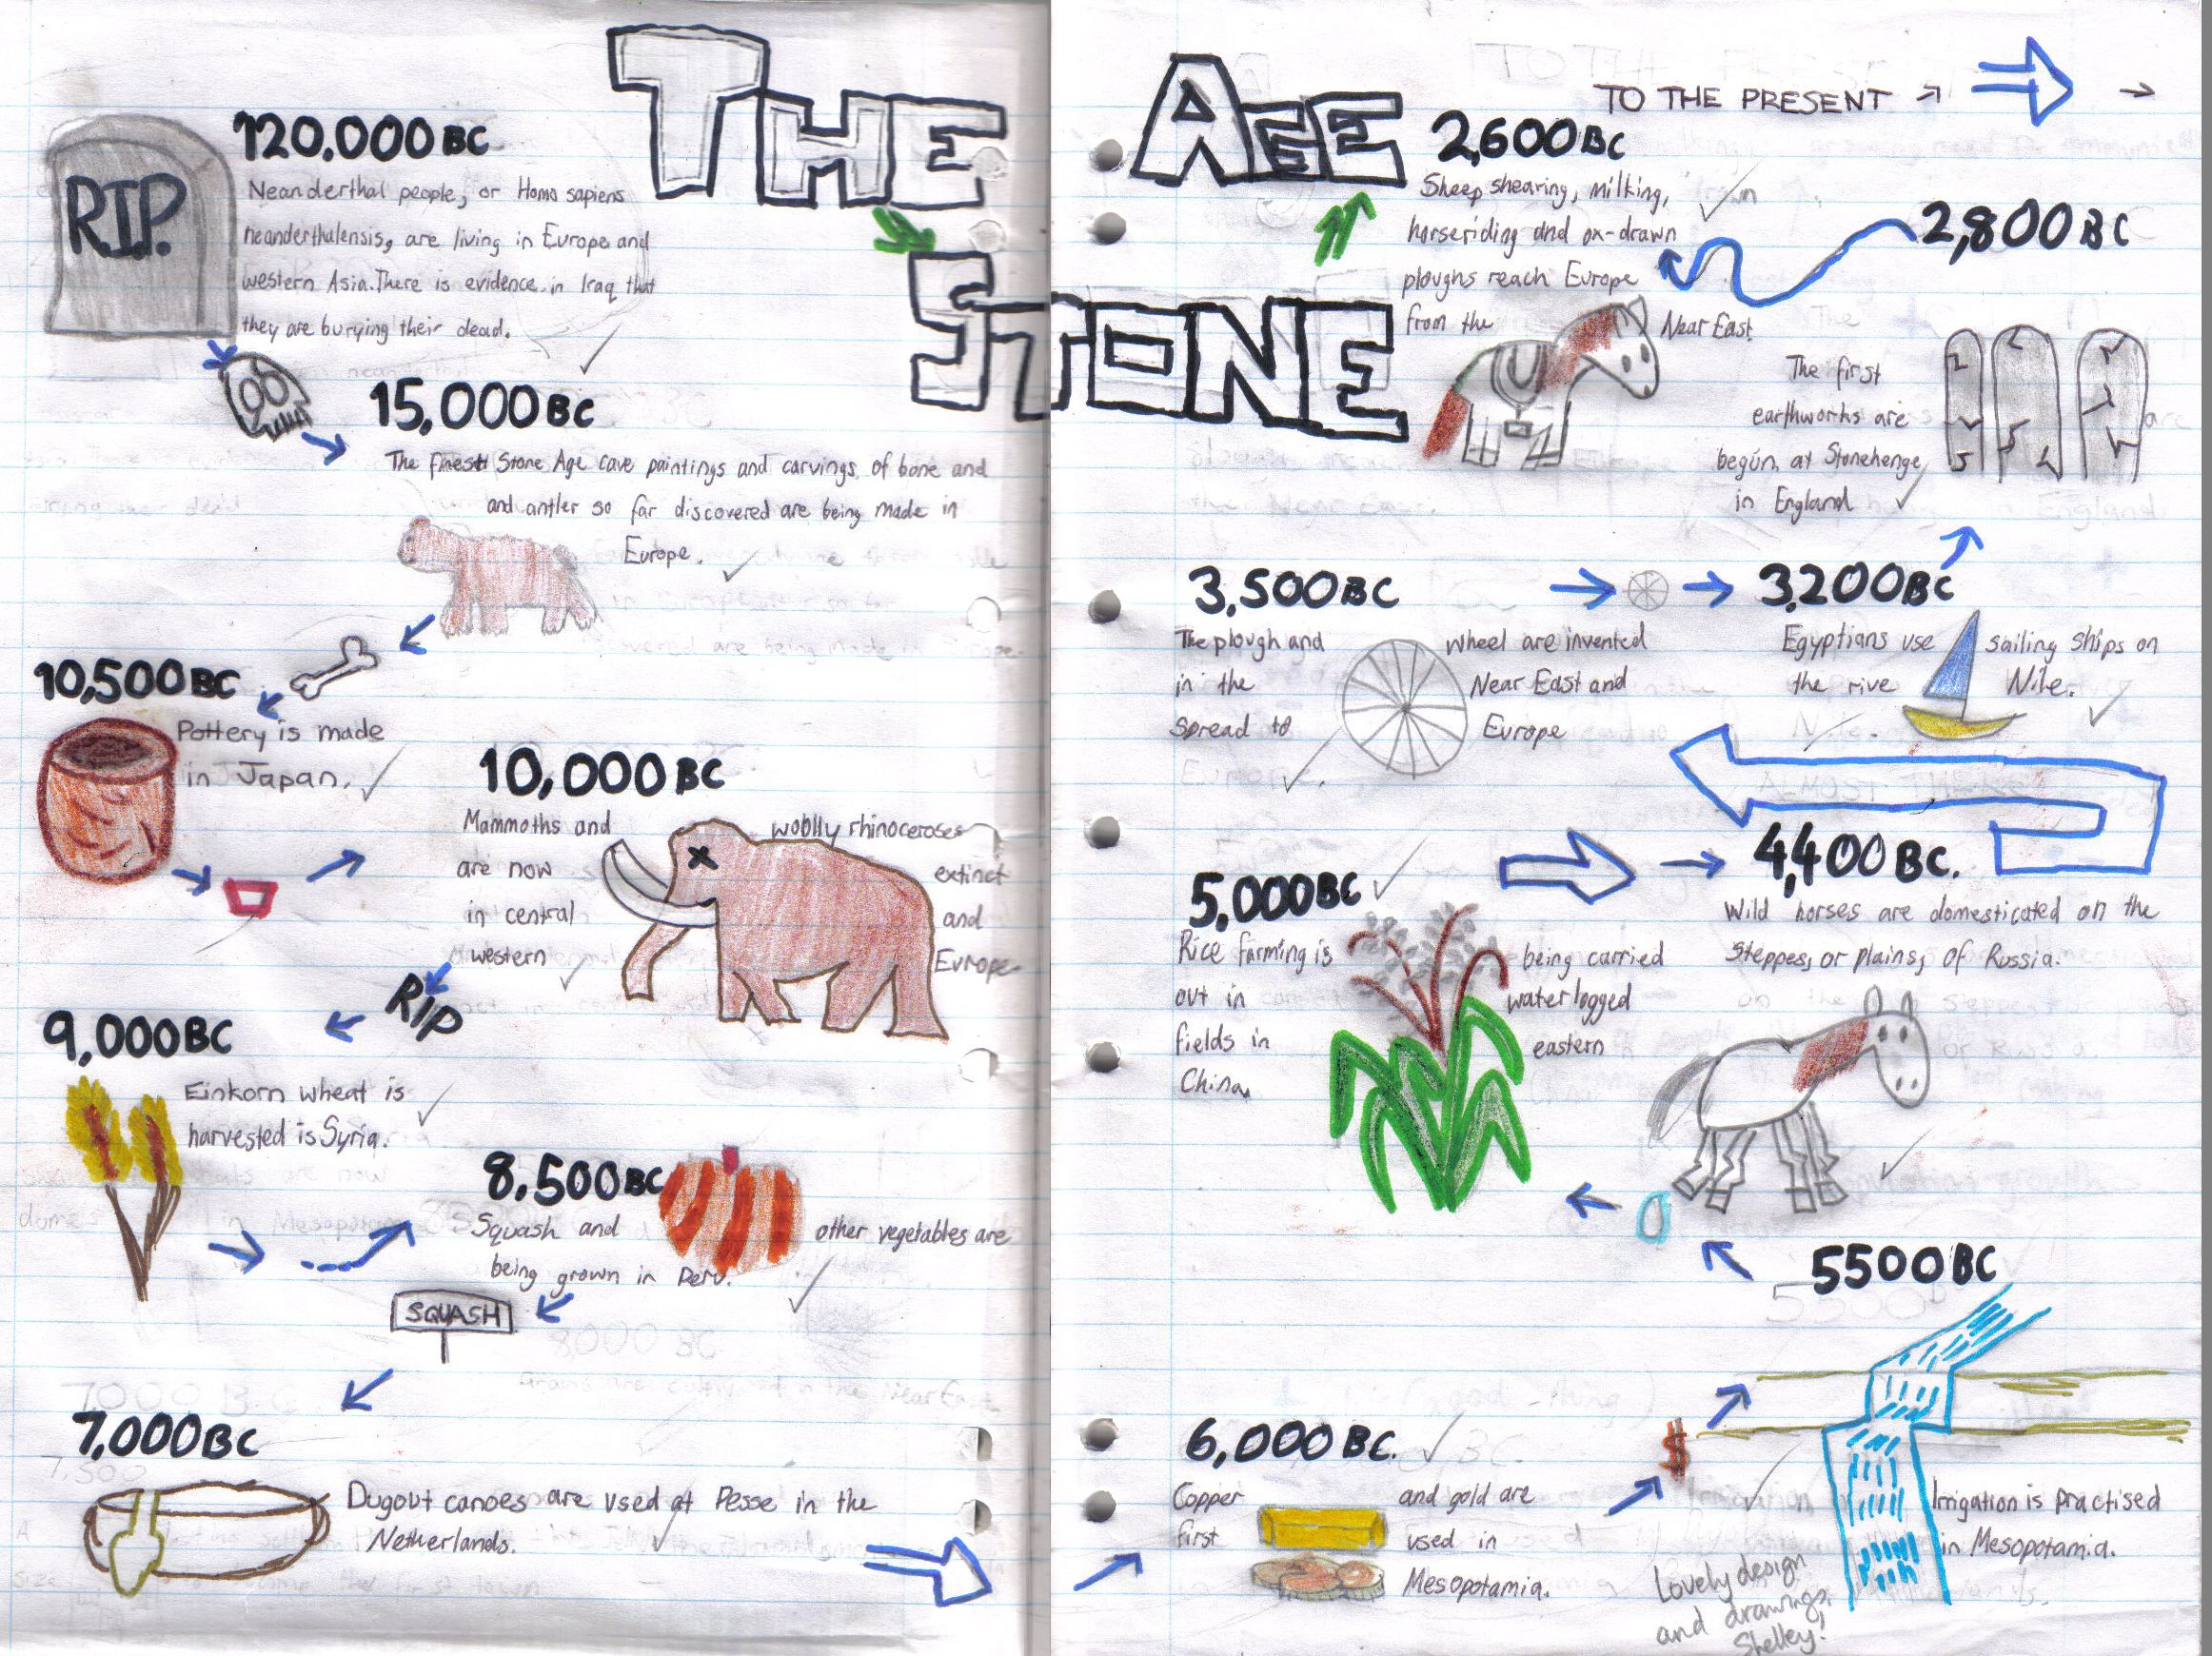 Shelley 7x Timeline Stone Age Copy